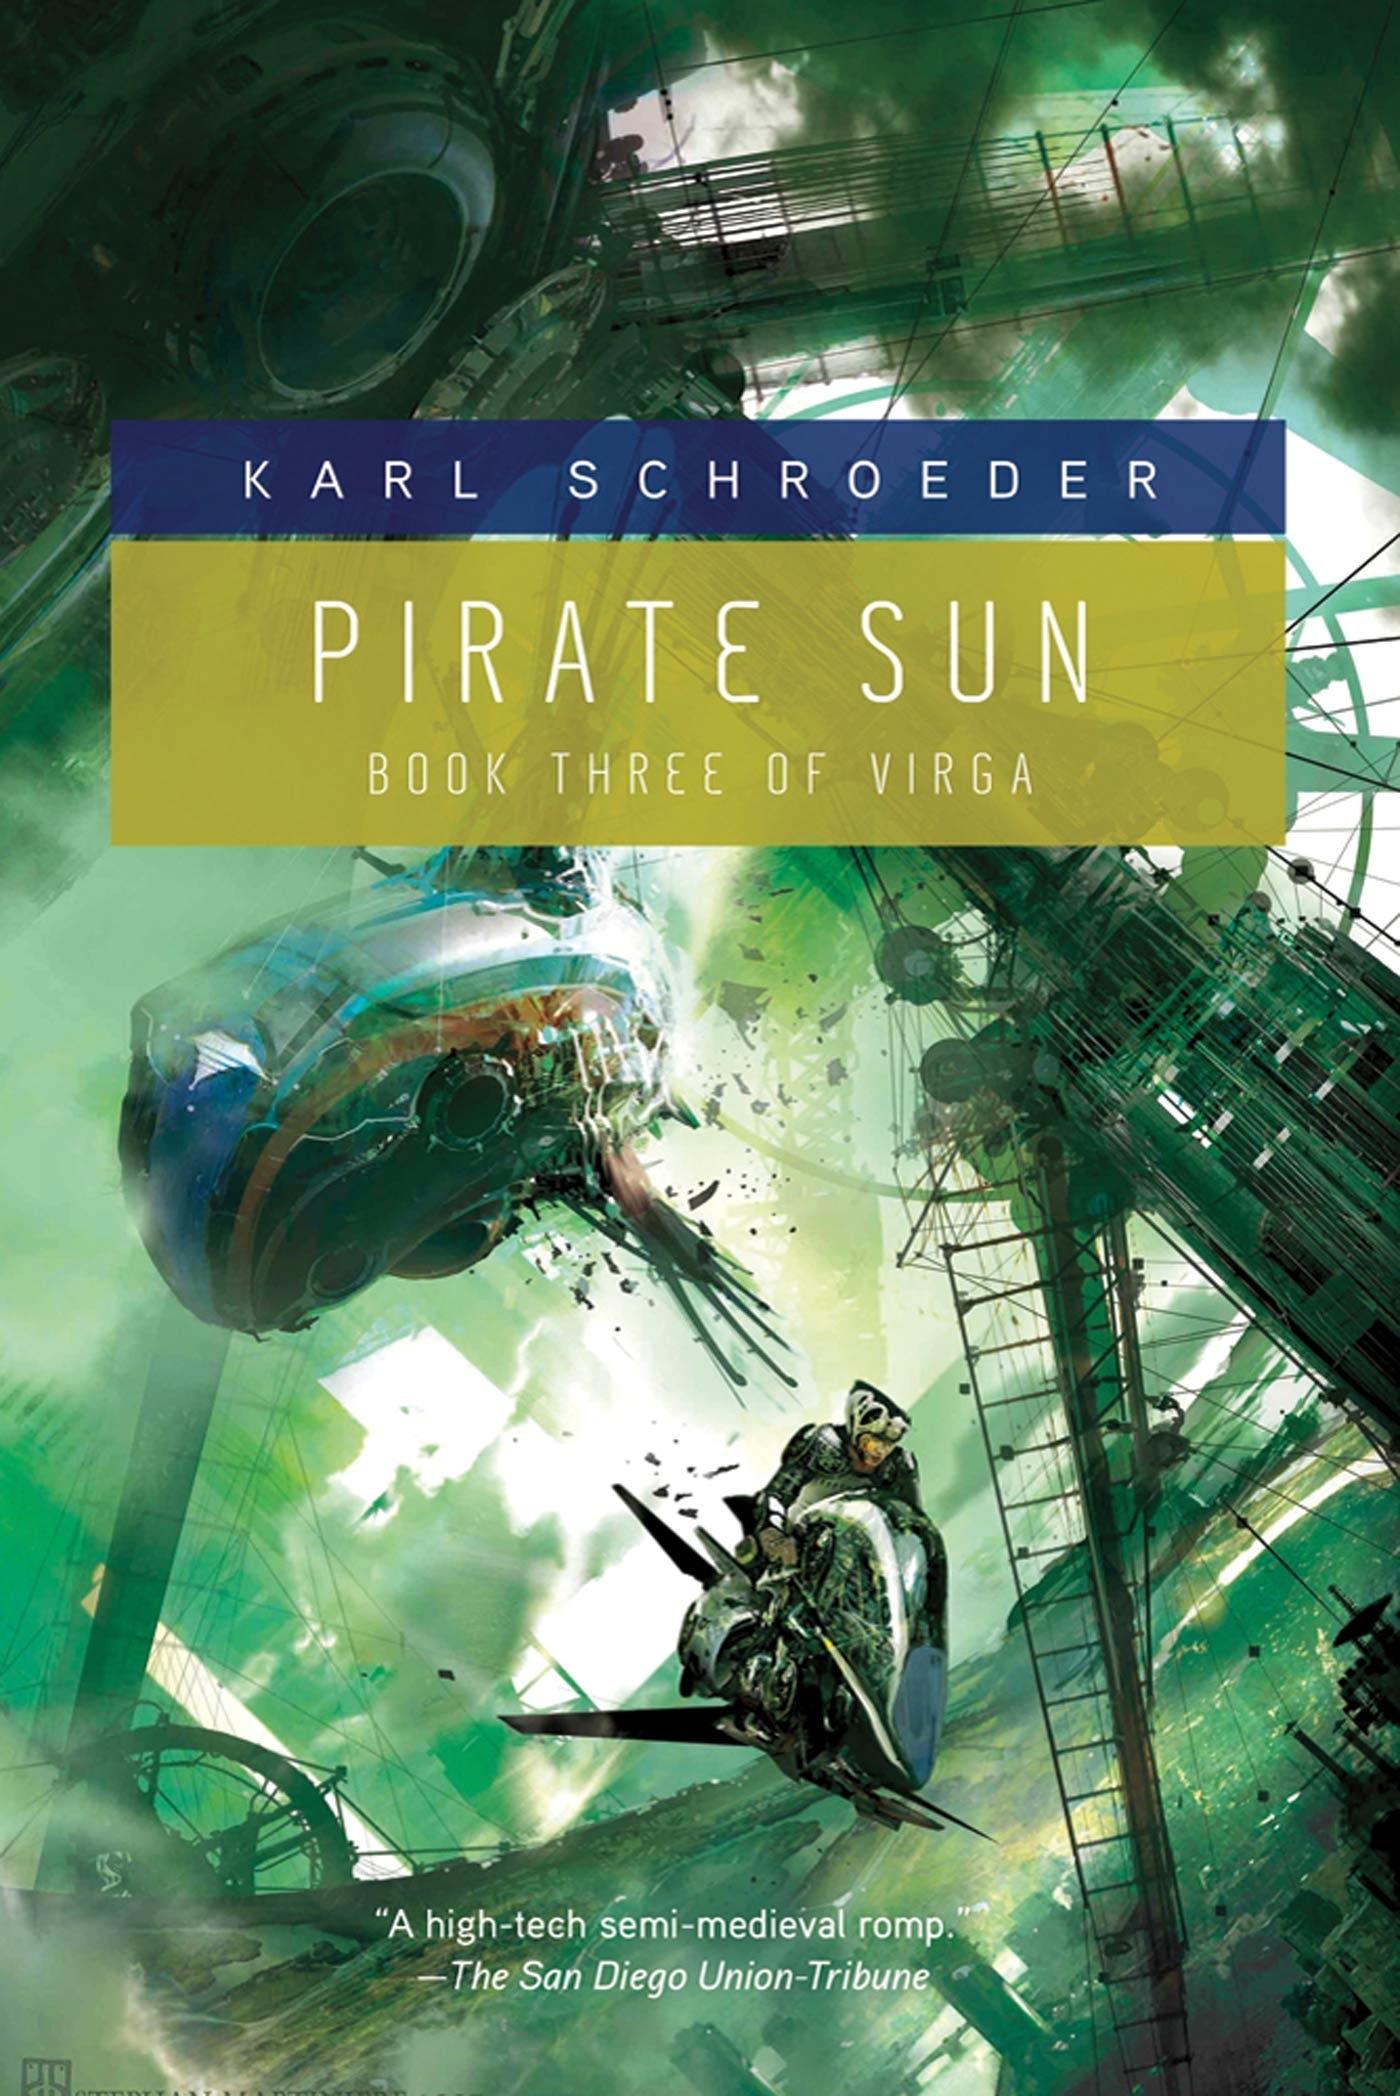 Image of Pirate Sun